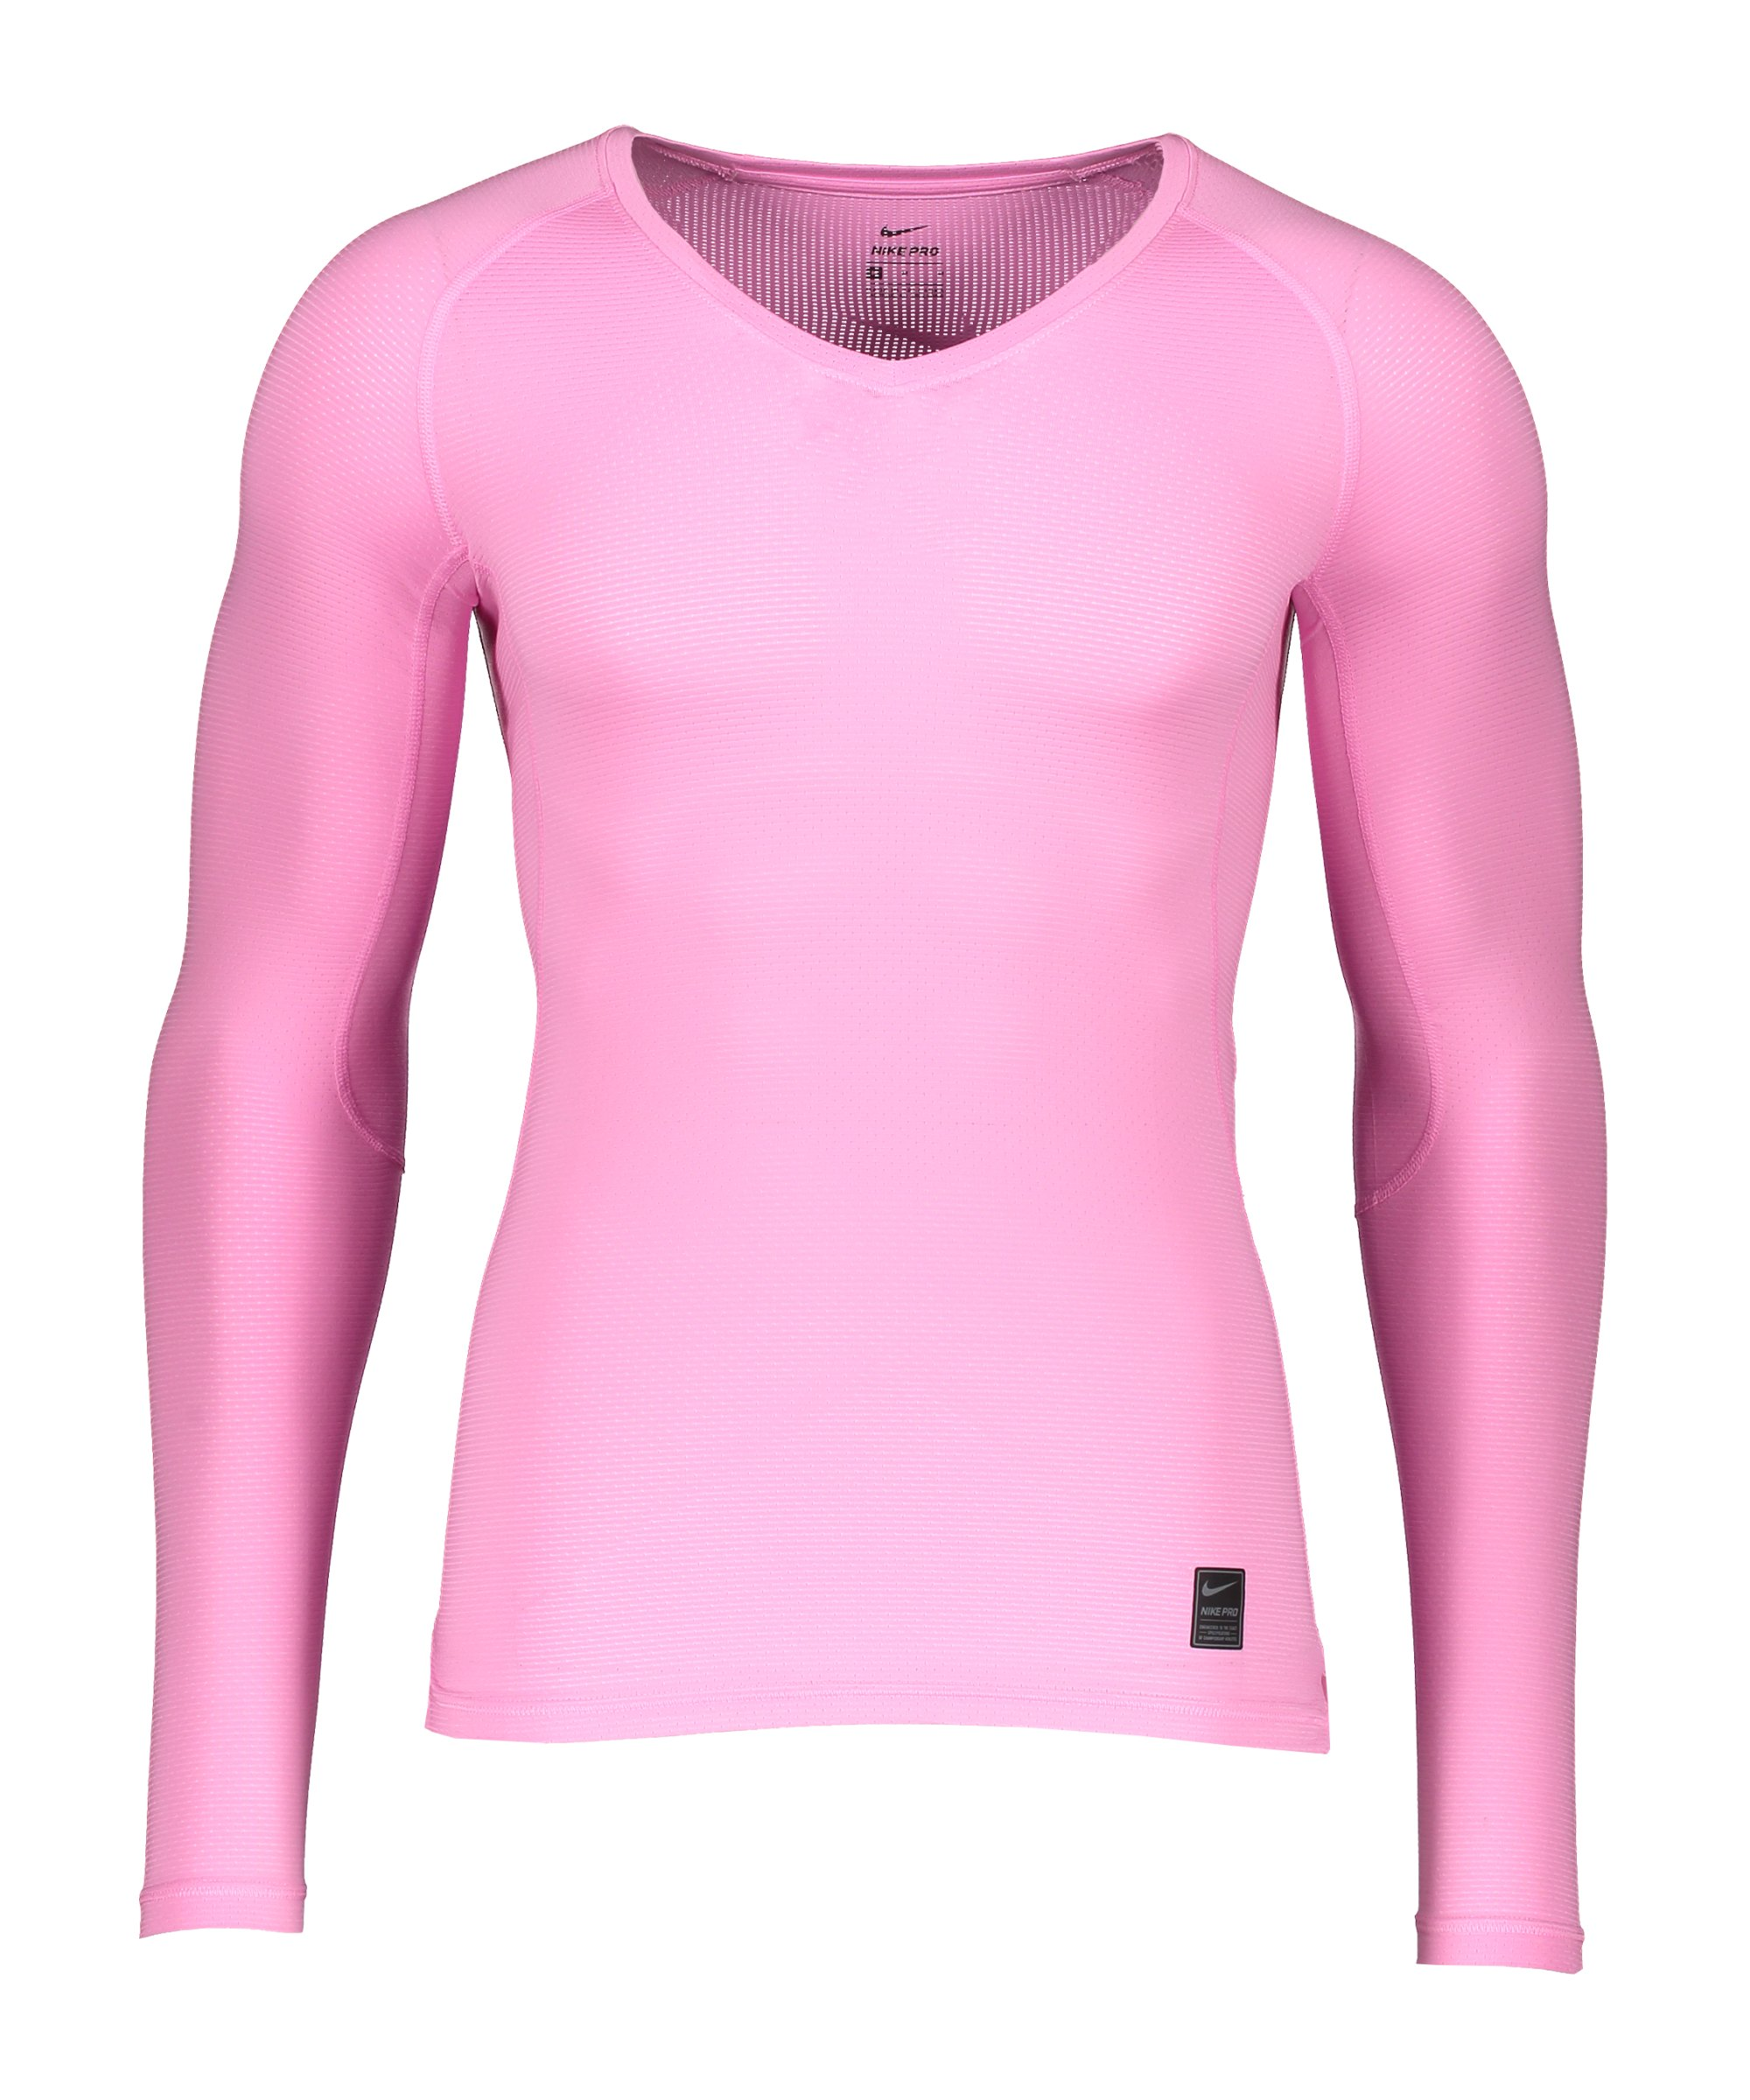 Nike Pro Hypercool Comp Shirt langarm Rosa F627 - rosa